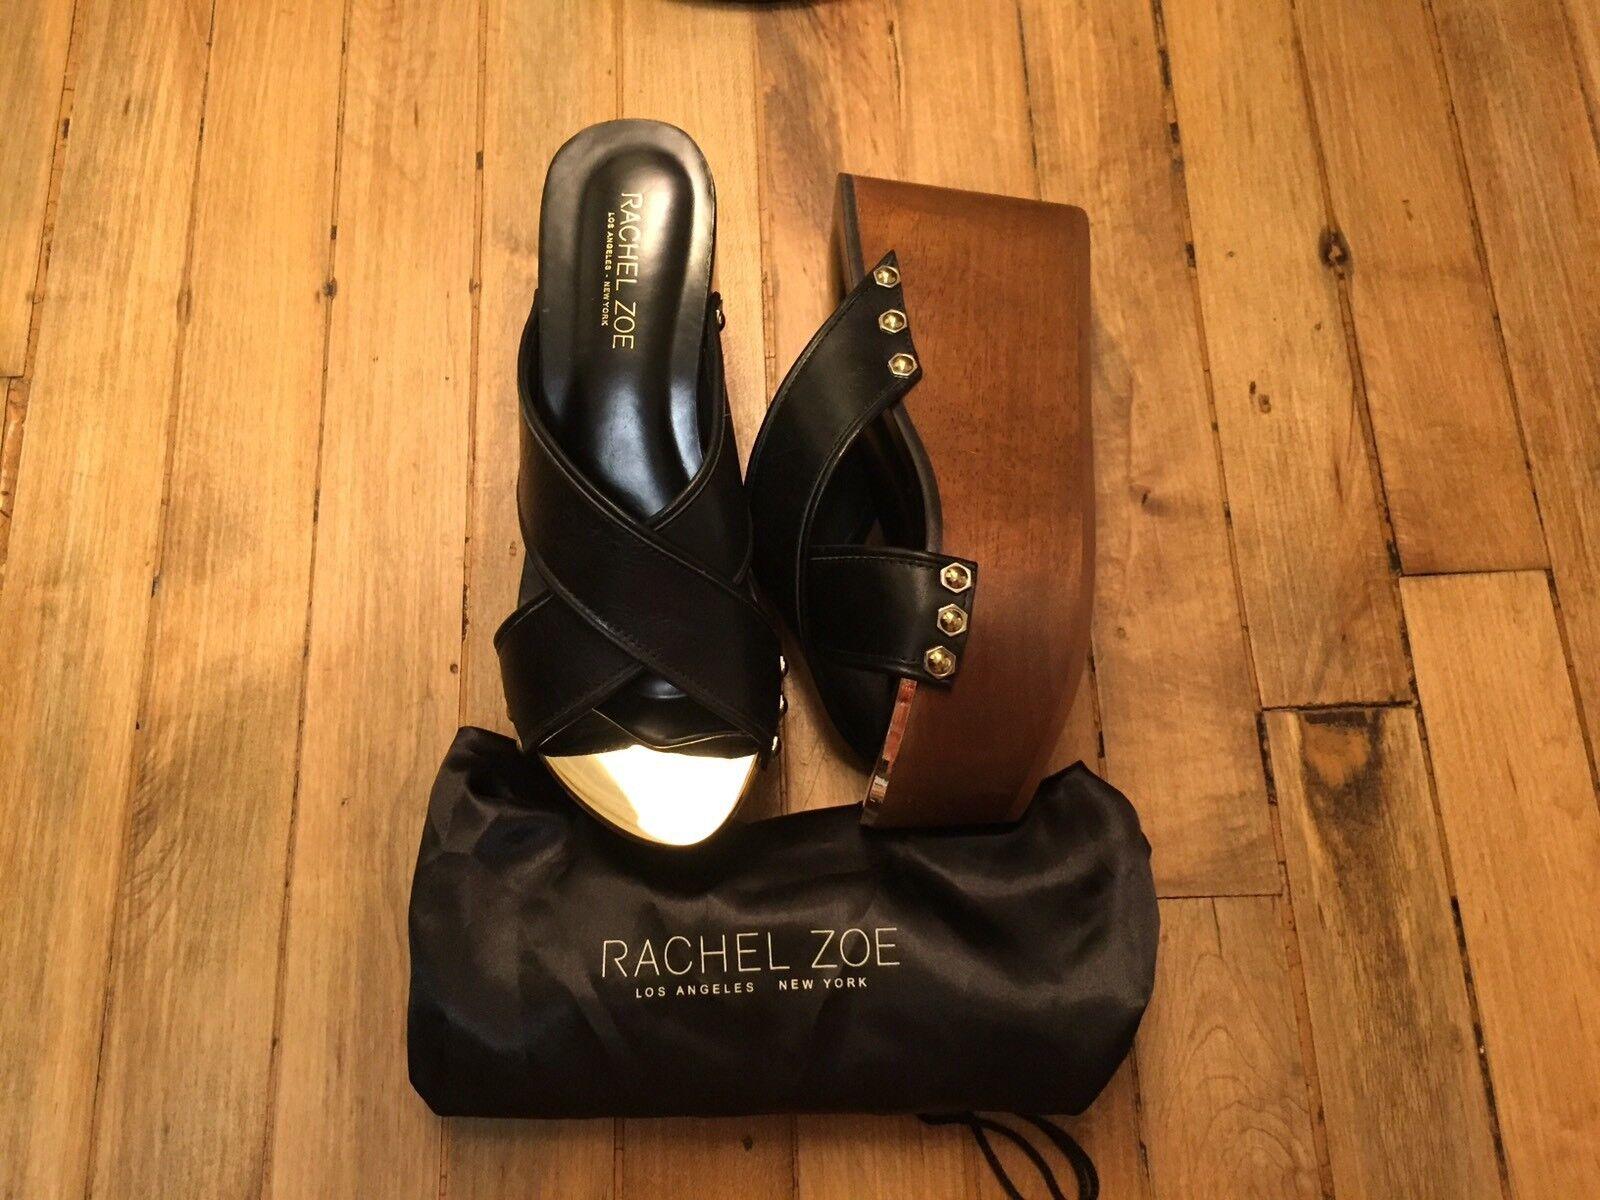 RACHAL ZOE MADDI WOODEN PLATFORM OPEN TOE Schuhe NEW SIZE 7.5 298.00